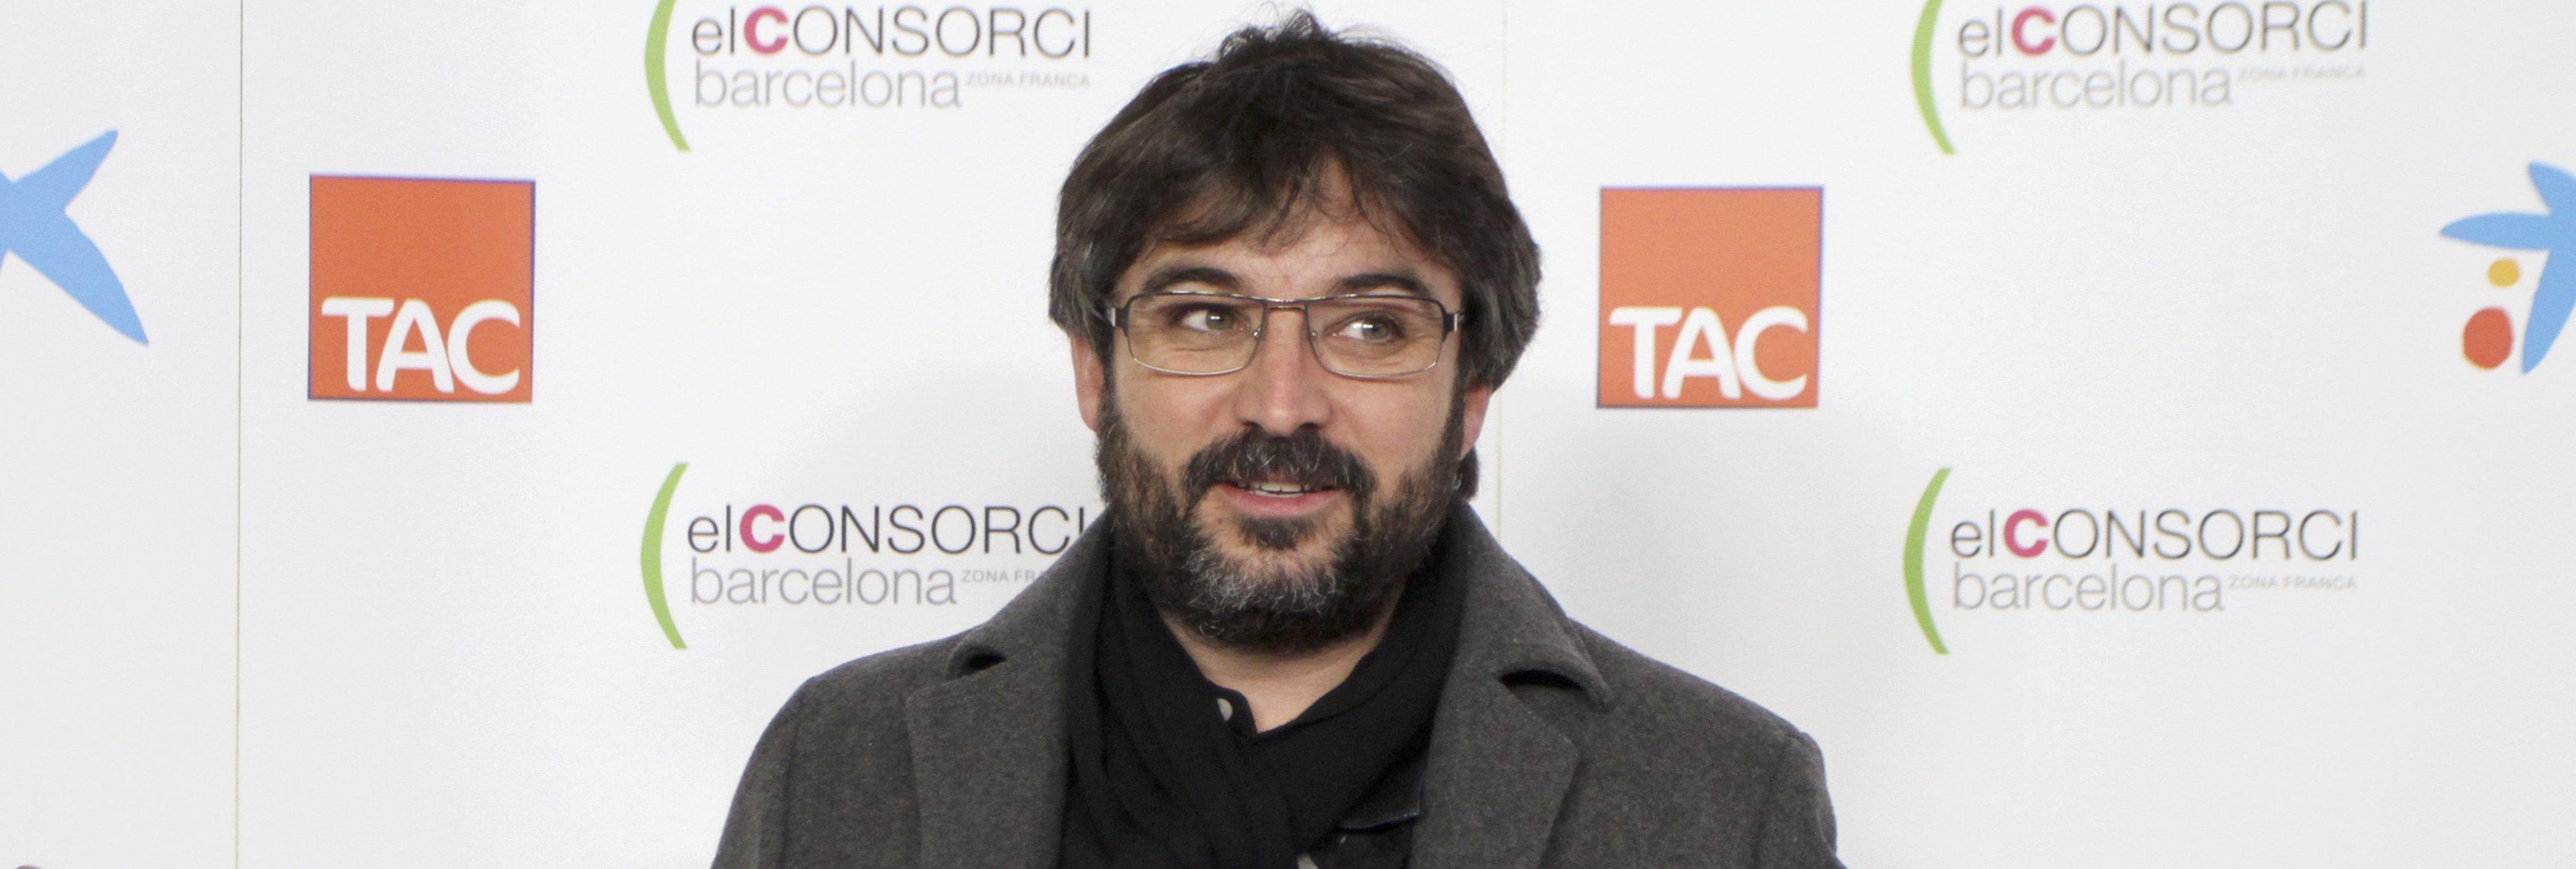 La fortuna millonaria de Jordi Évole